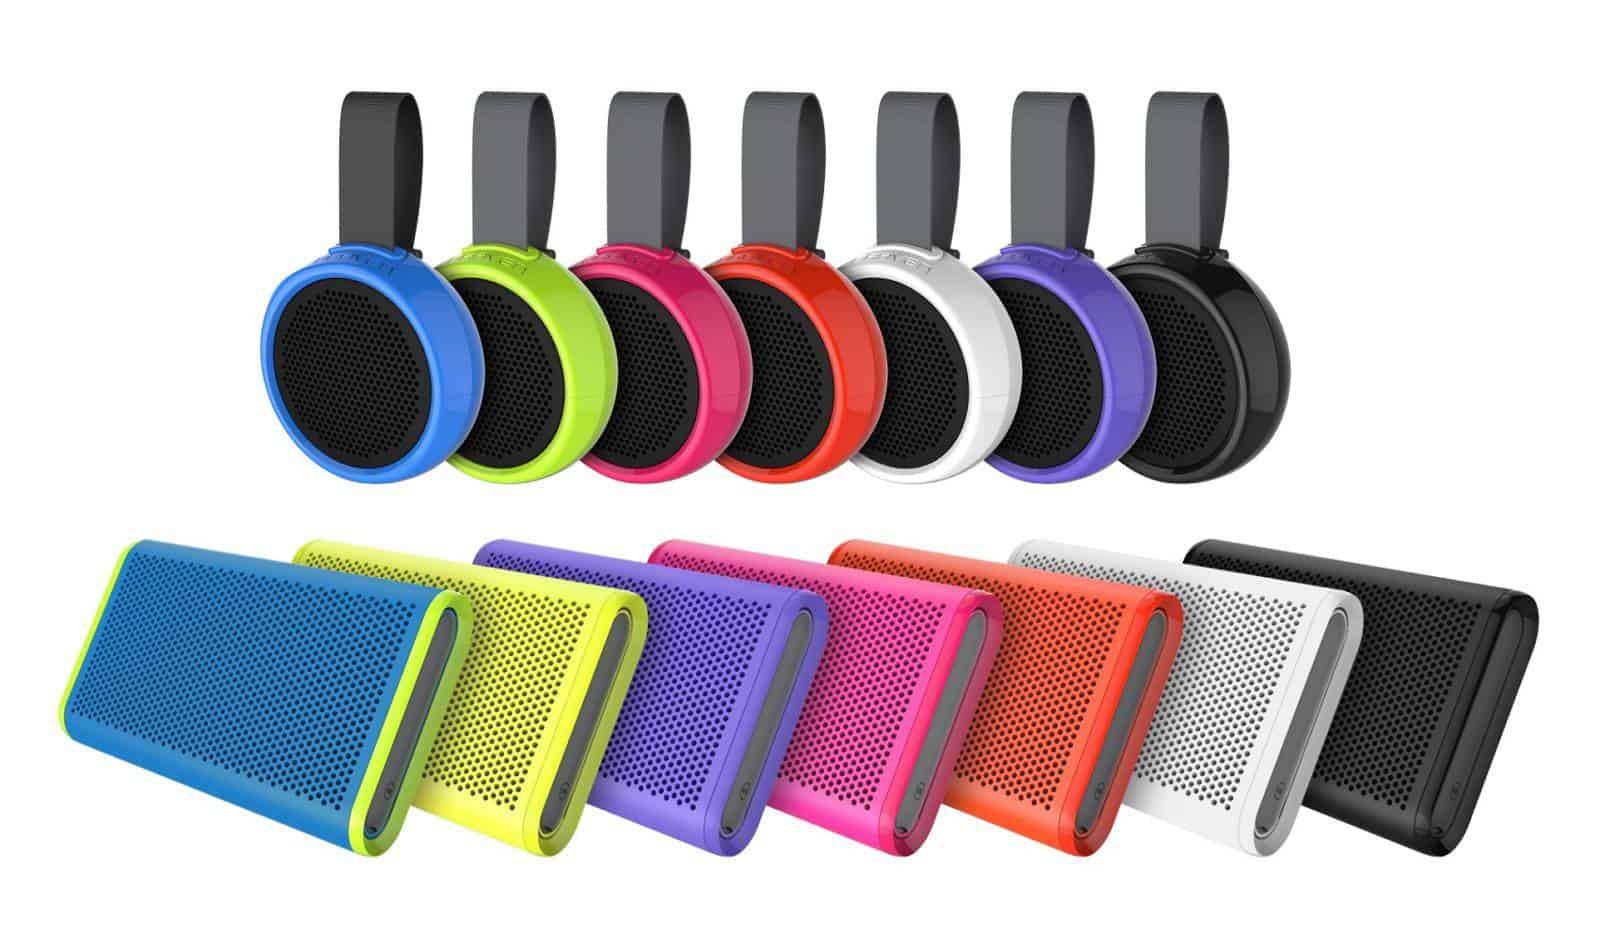 BRAVEN 105 & 405 Bluetooth Speakers